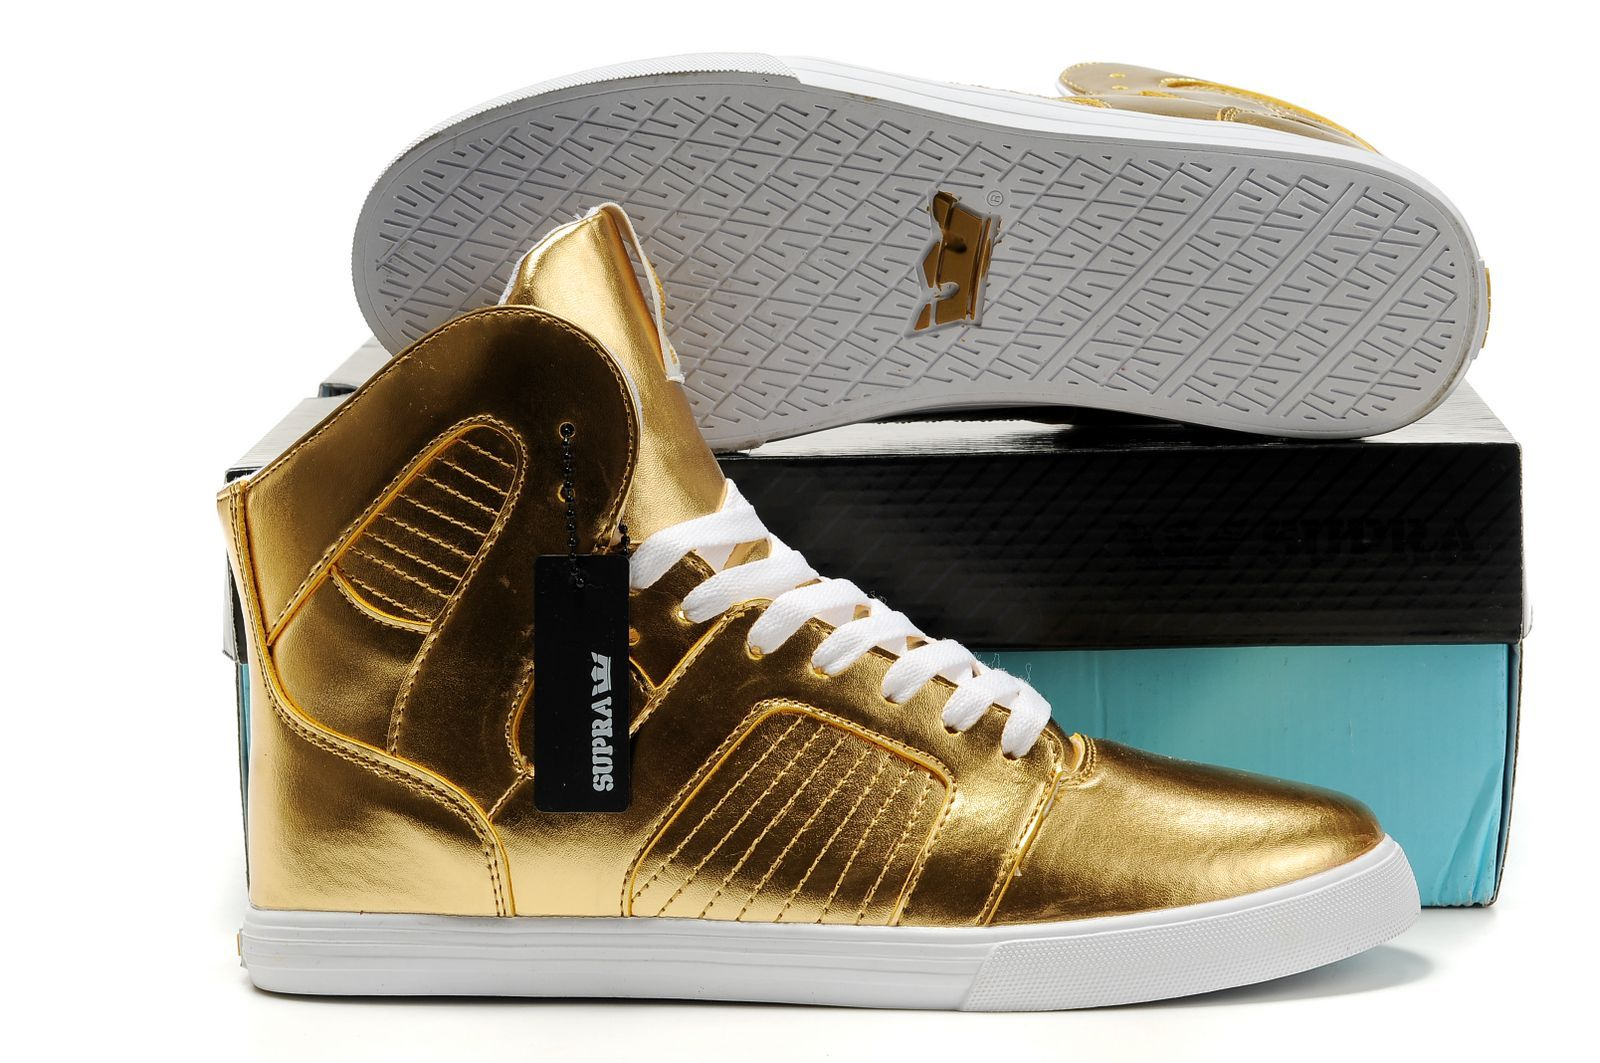 Supra Pilot Gold Shoes [A830028sp] - €76.50 : Scarpe Supra, Supra Italia